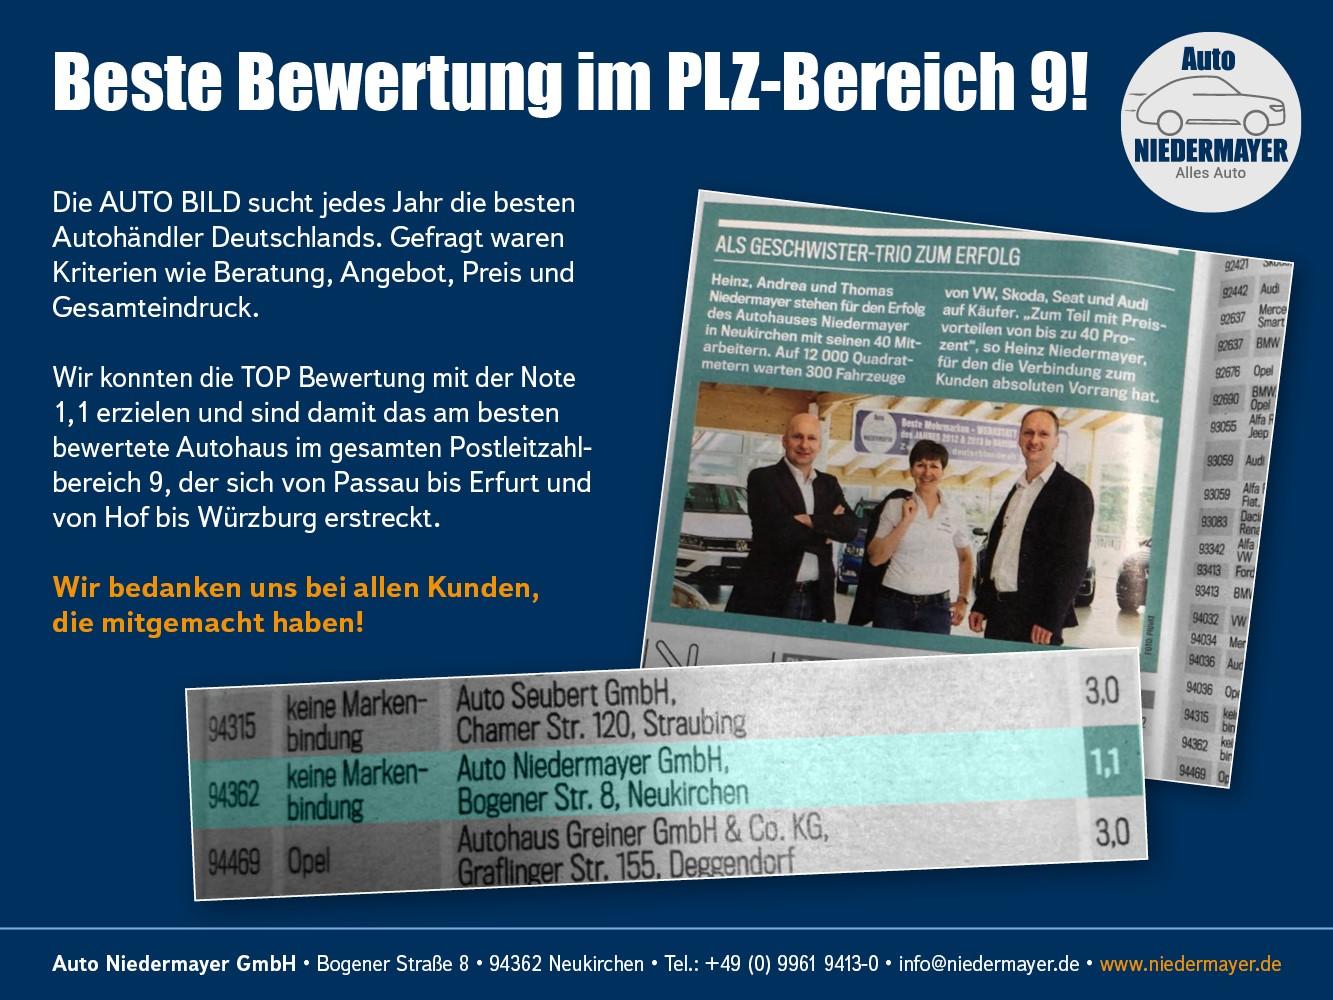 SKODA KAROQ 2.0 TDI 4x4 Ambition, Navi, Kamera, el. Heckklappe, sofort Auto Niedermayer B2B, D-94362 Neukirchen